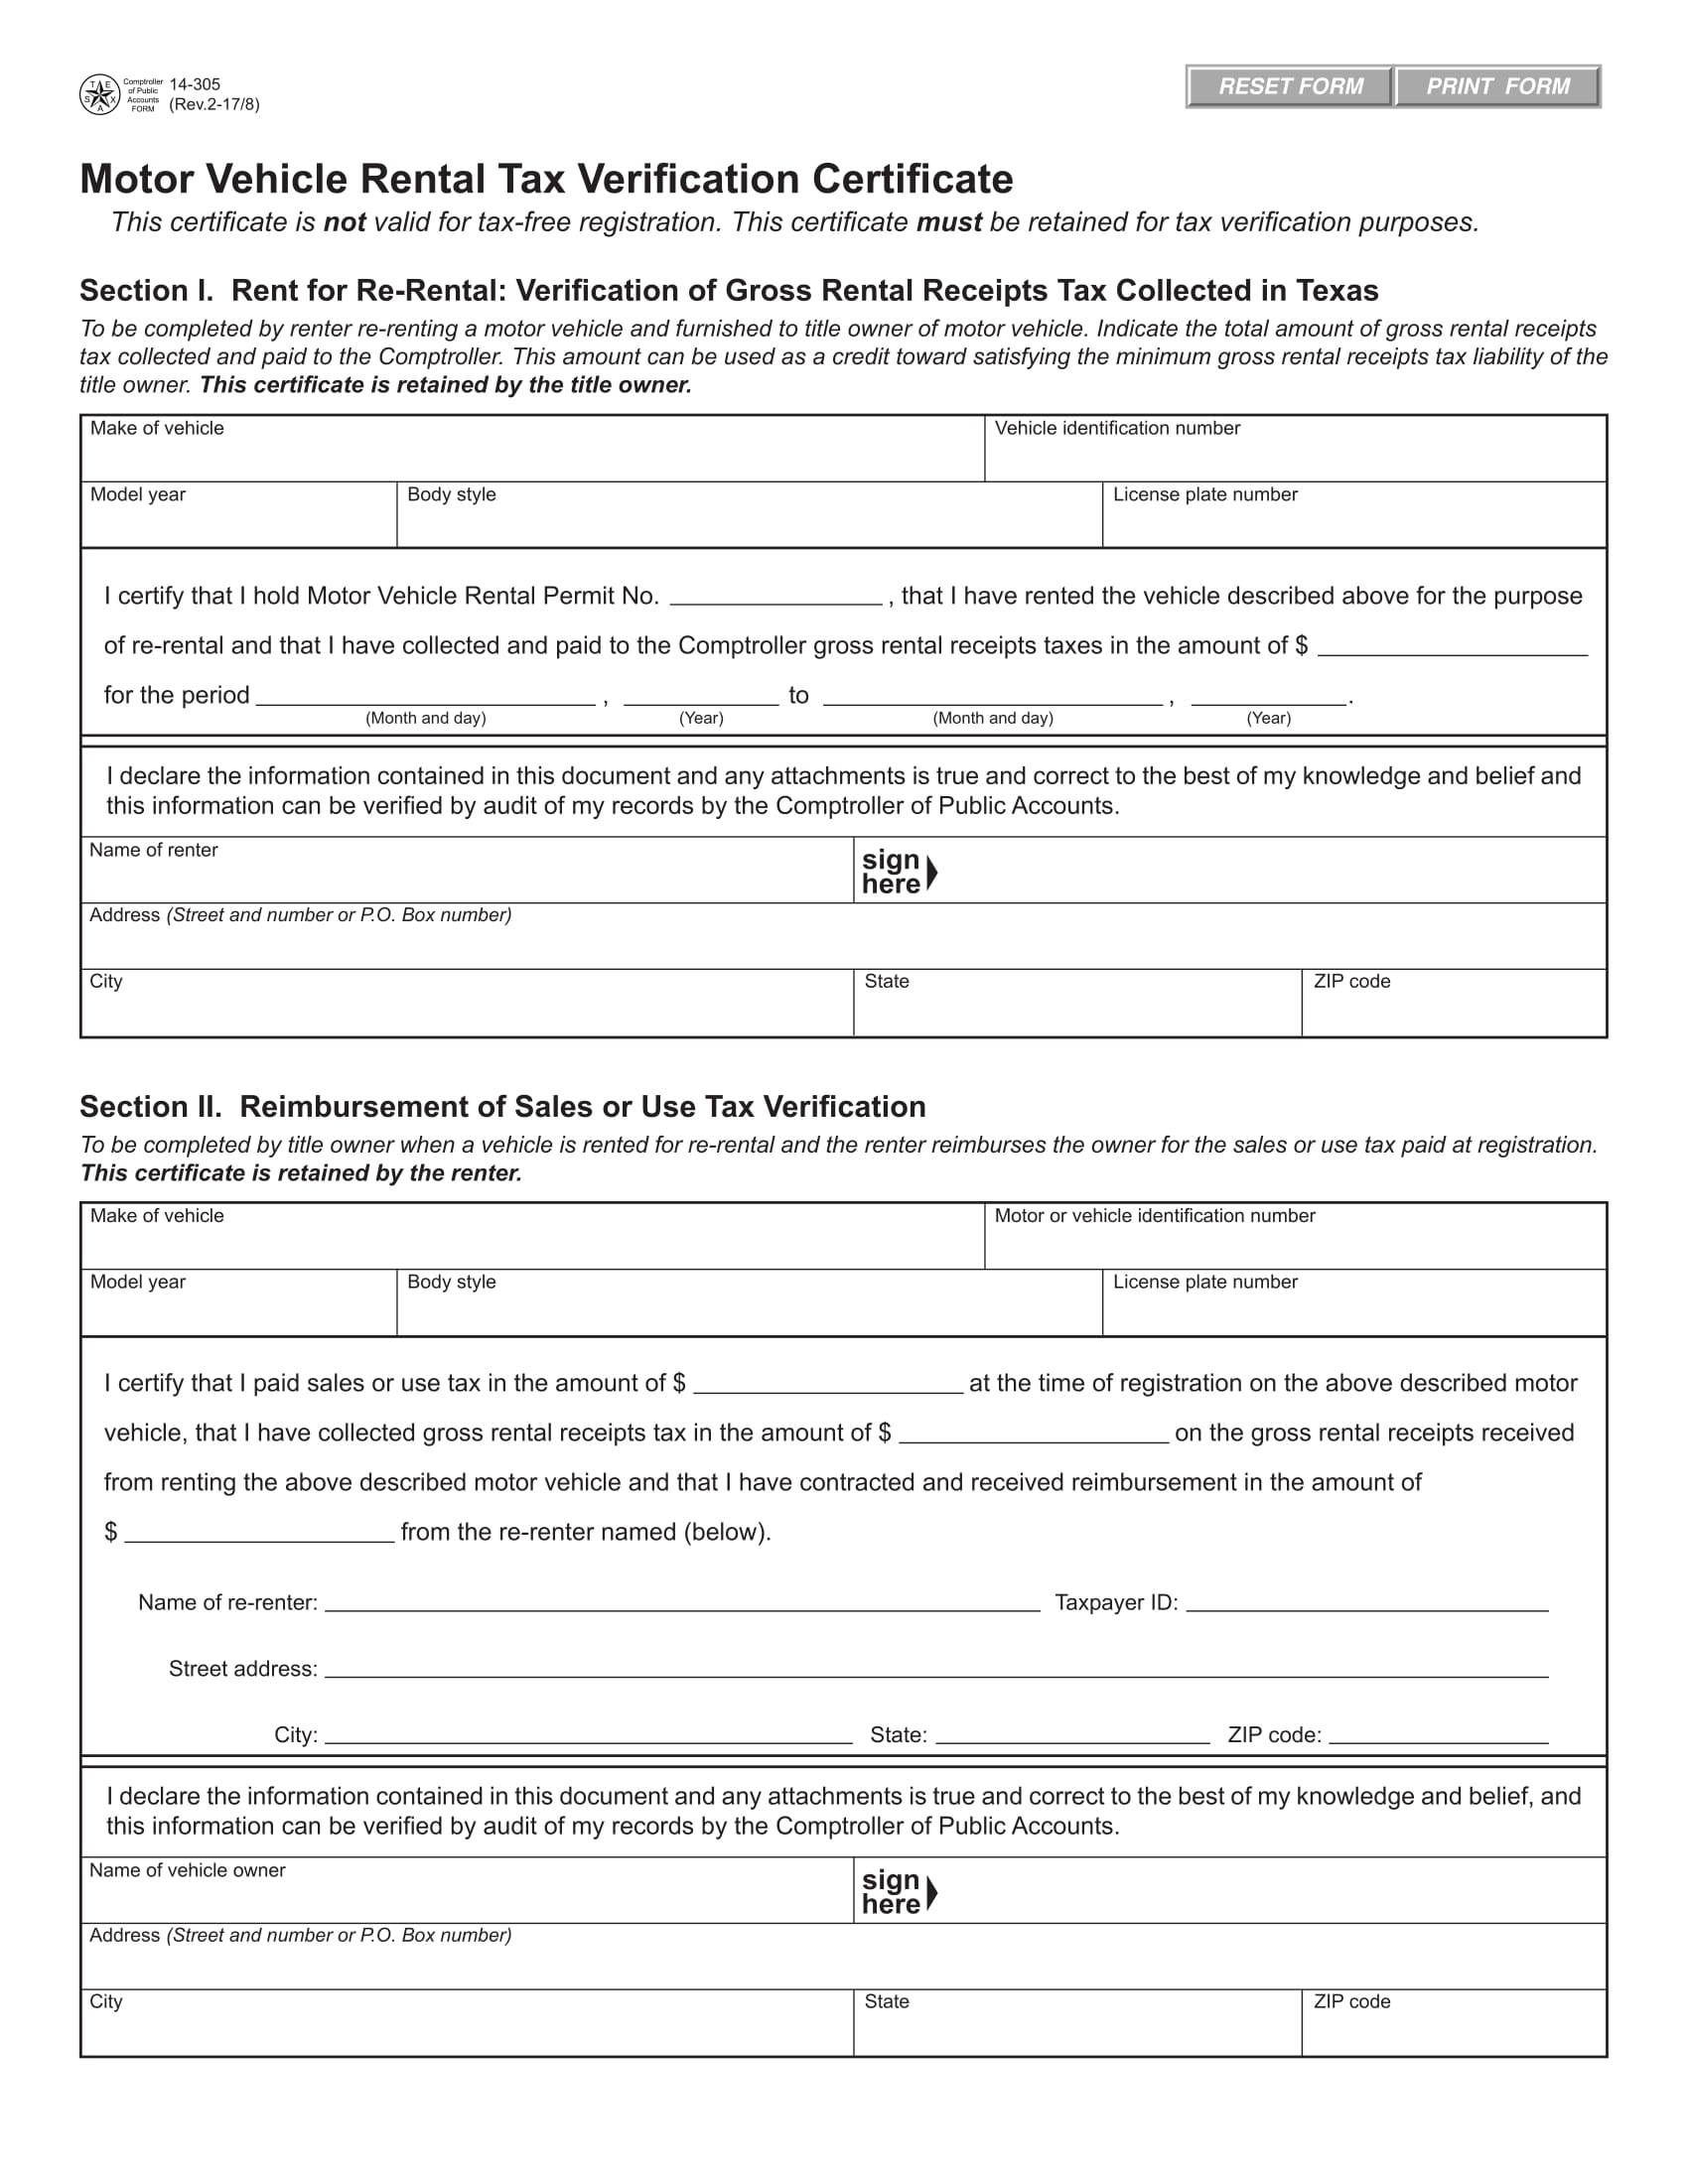 vehicle rental tax verification form 1